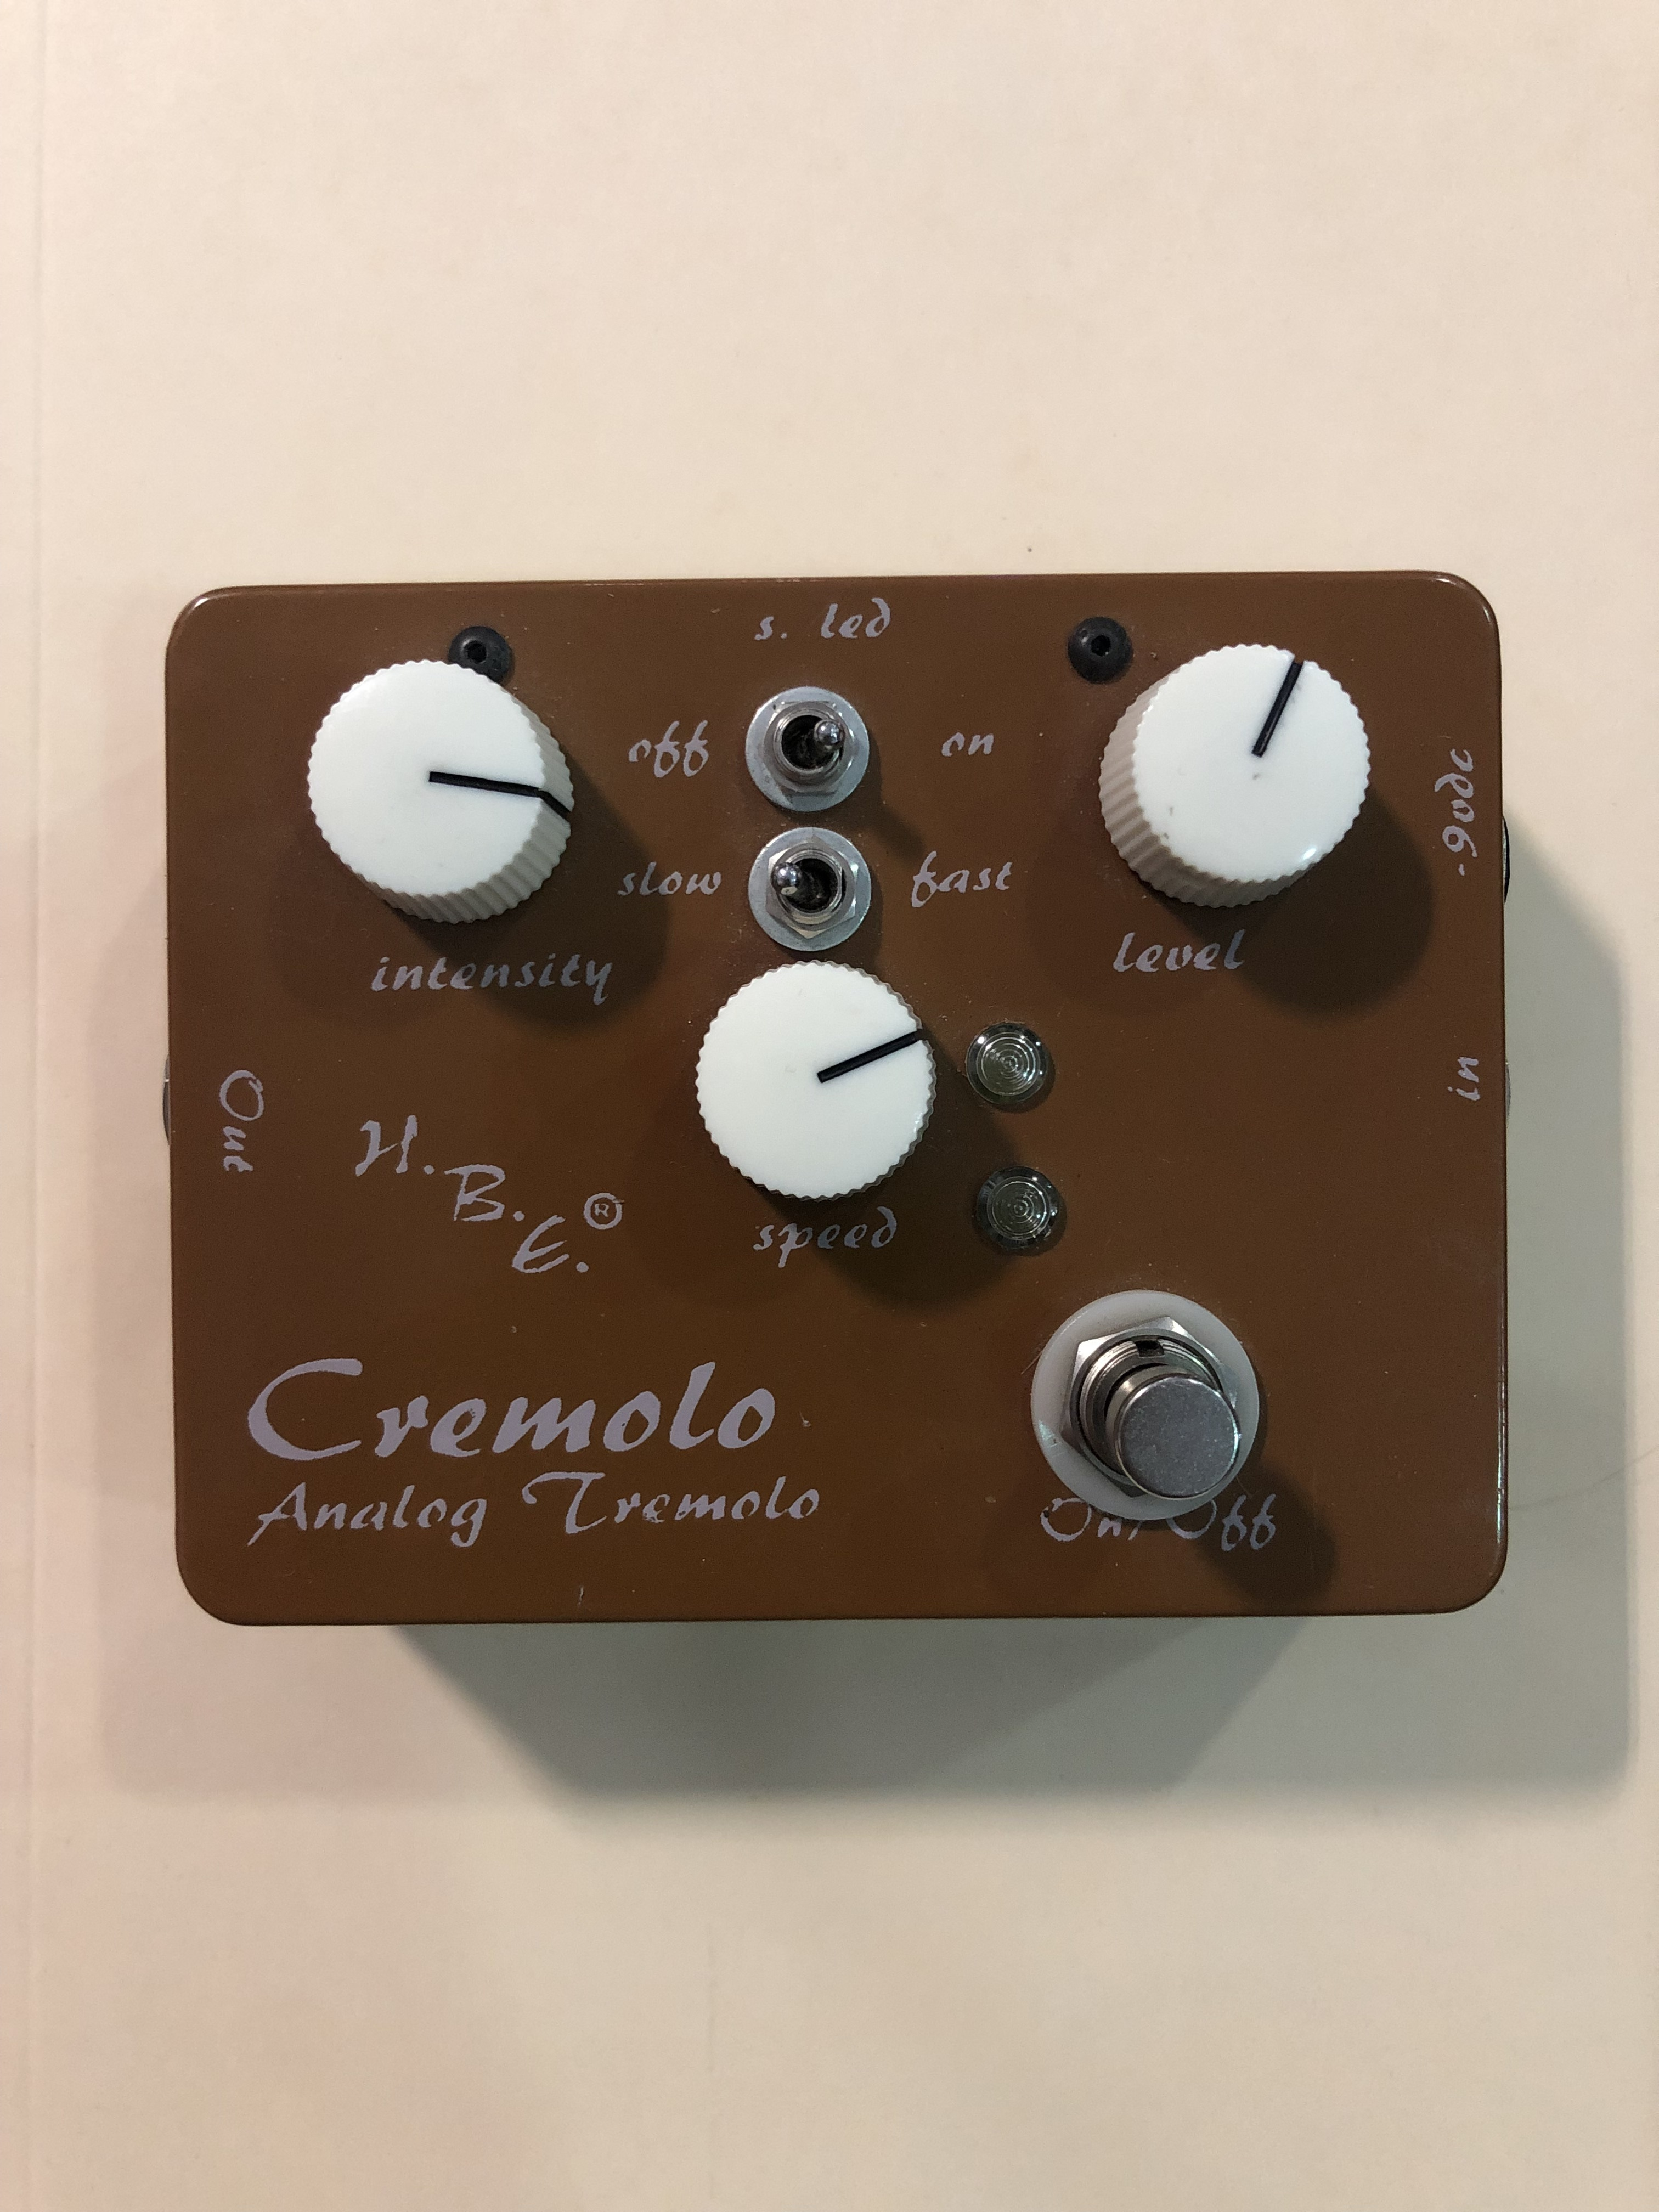 HOMEBREW ELECTRONICS - CREMOLO -  ANALOG TREMOLO EFFECTS PEDAL